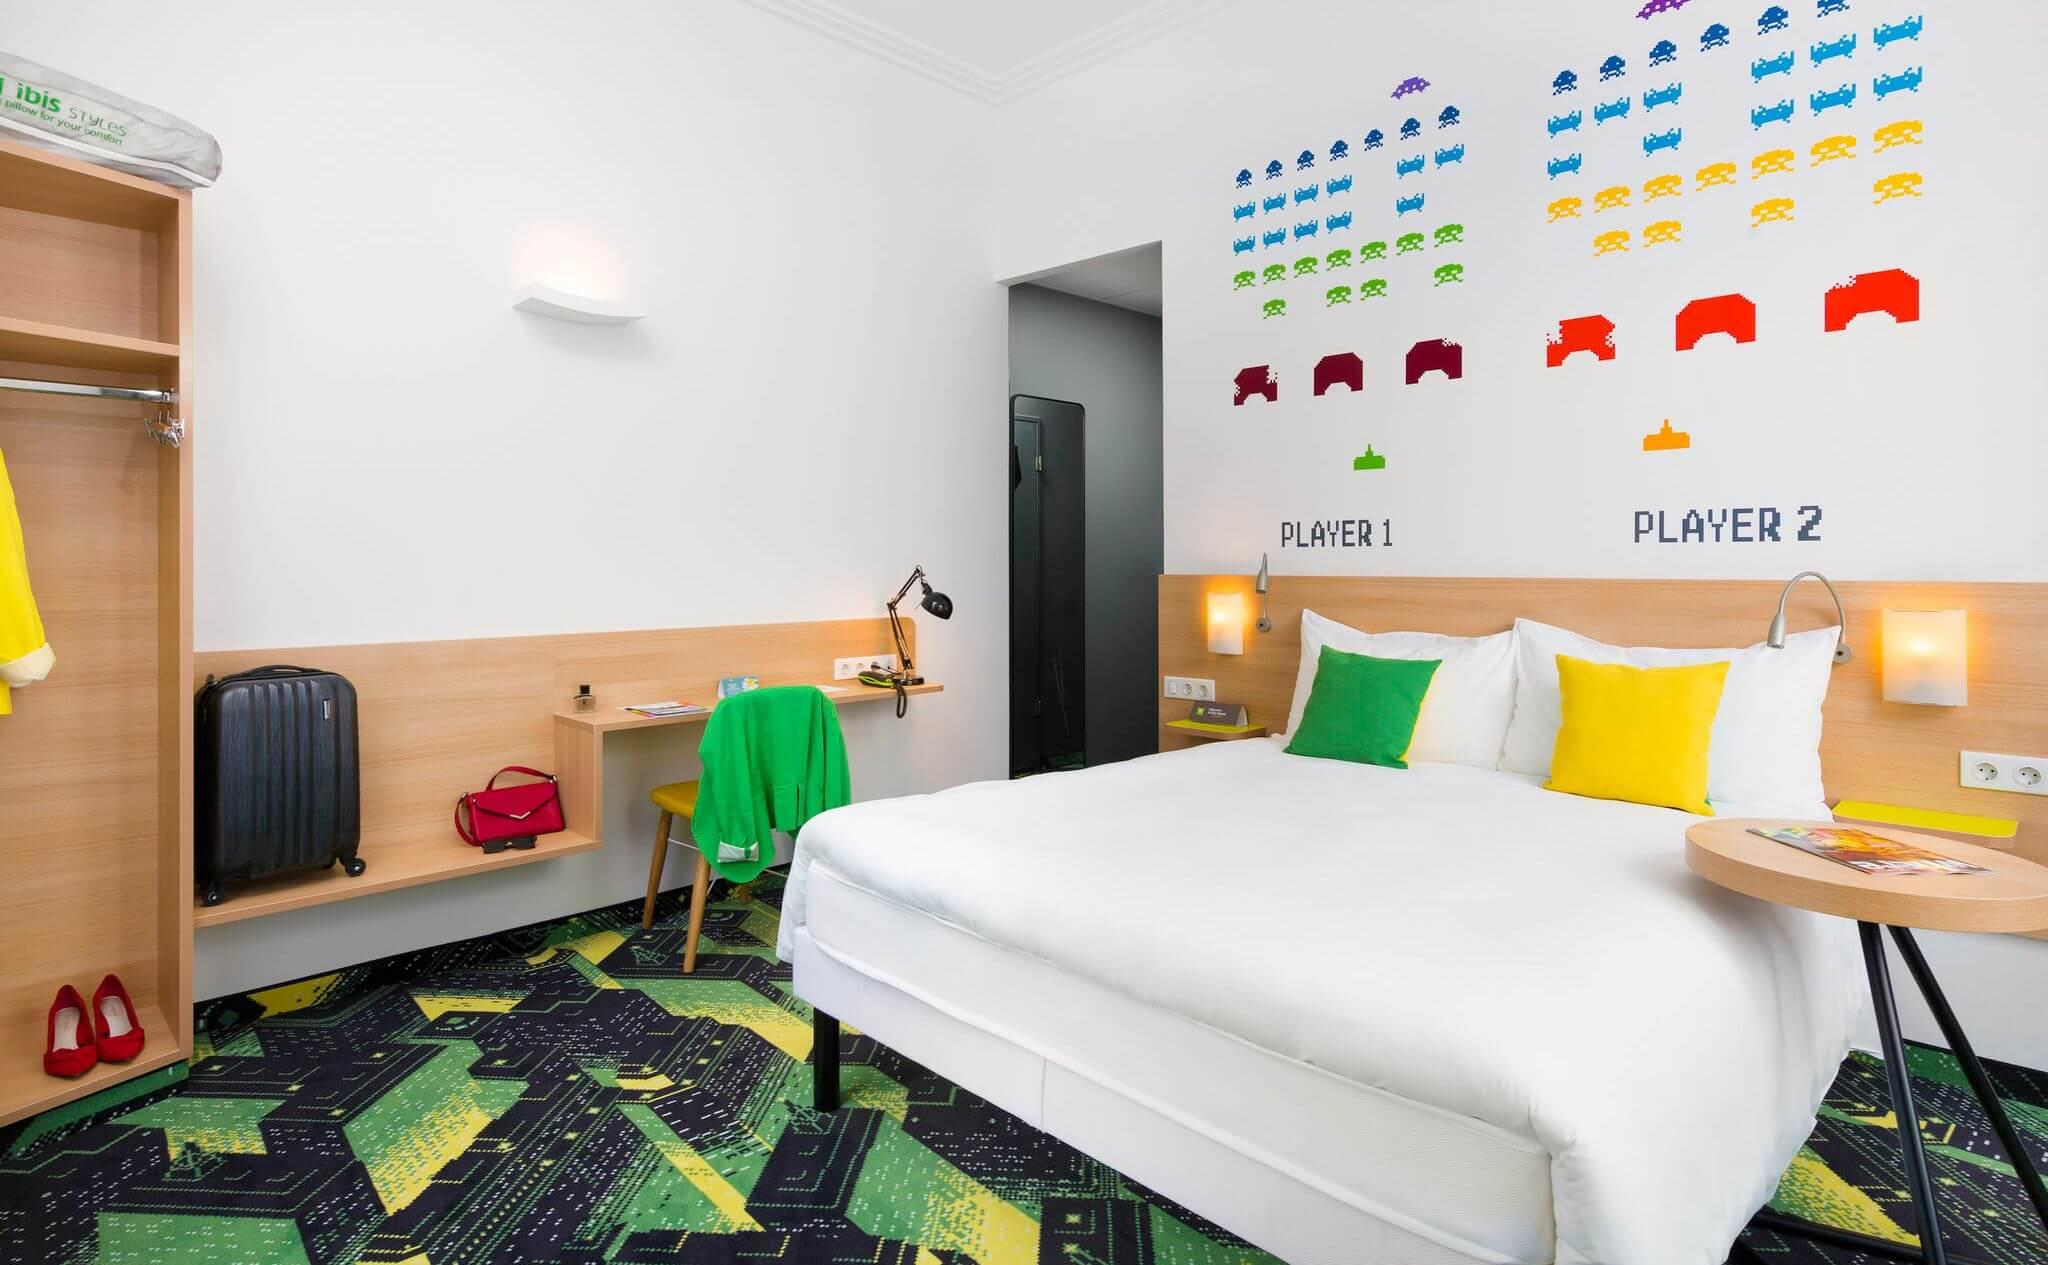 ibis styles budapest center מלון איביס בודפשט